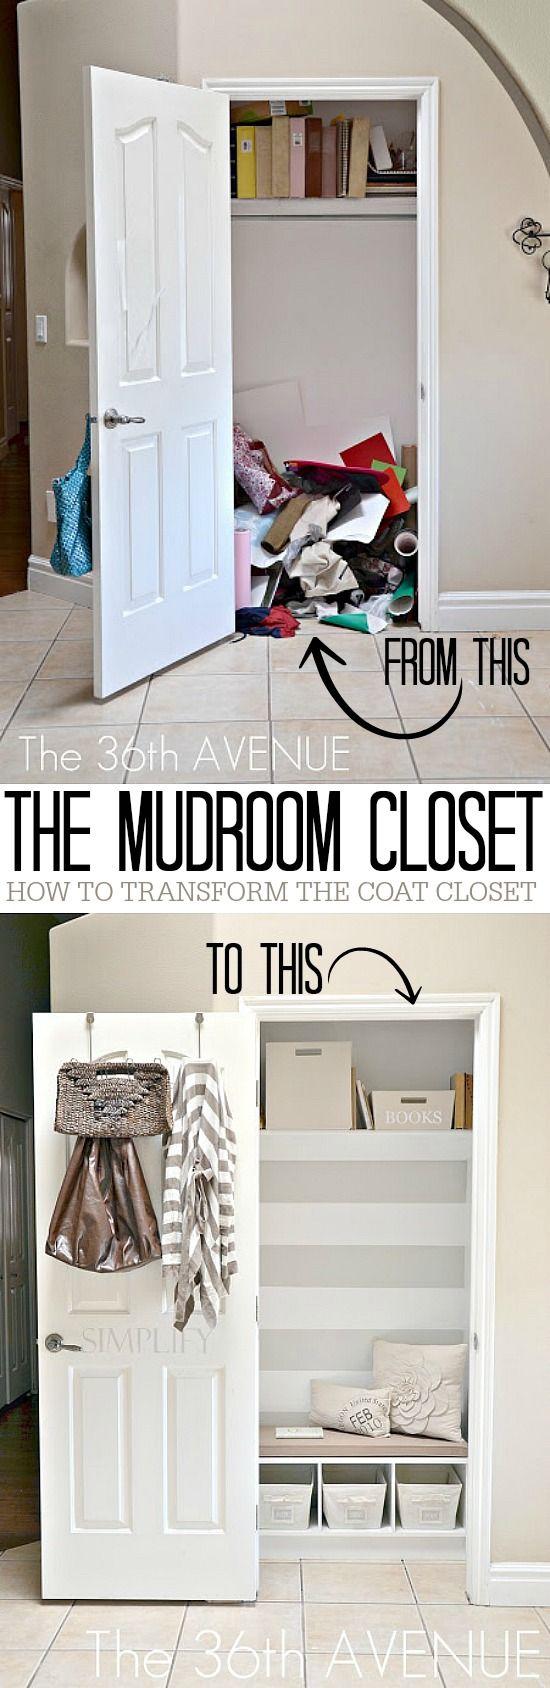 DIY Home Project - Transform an ordinary closet into an extraordinary mini mudroom !